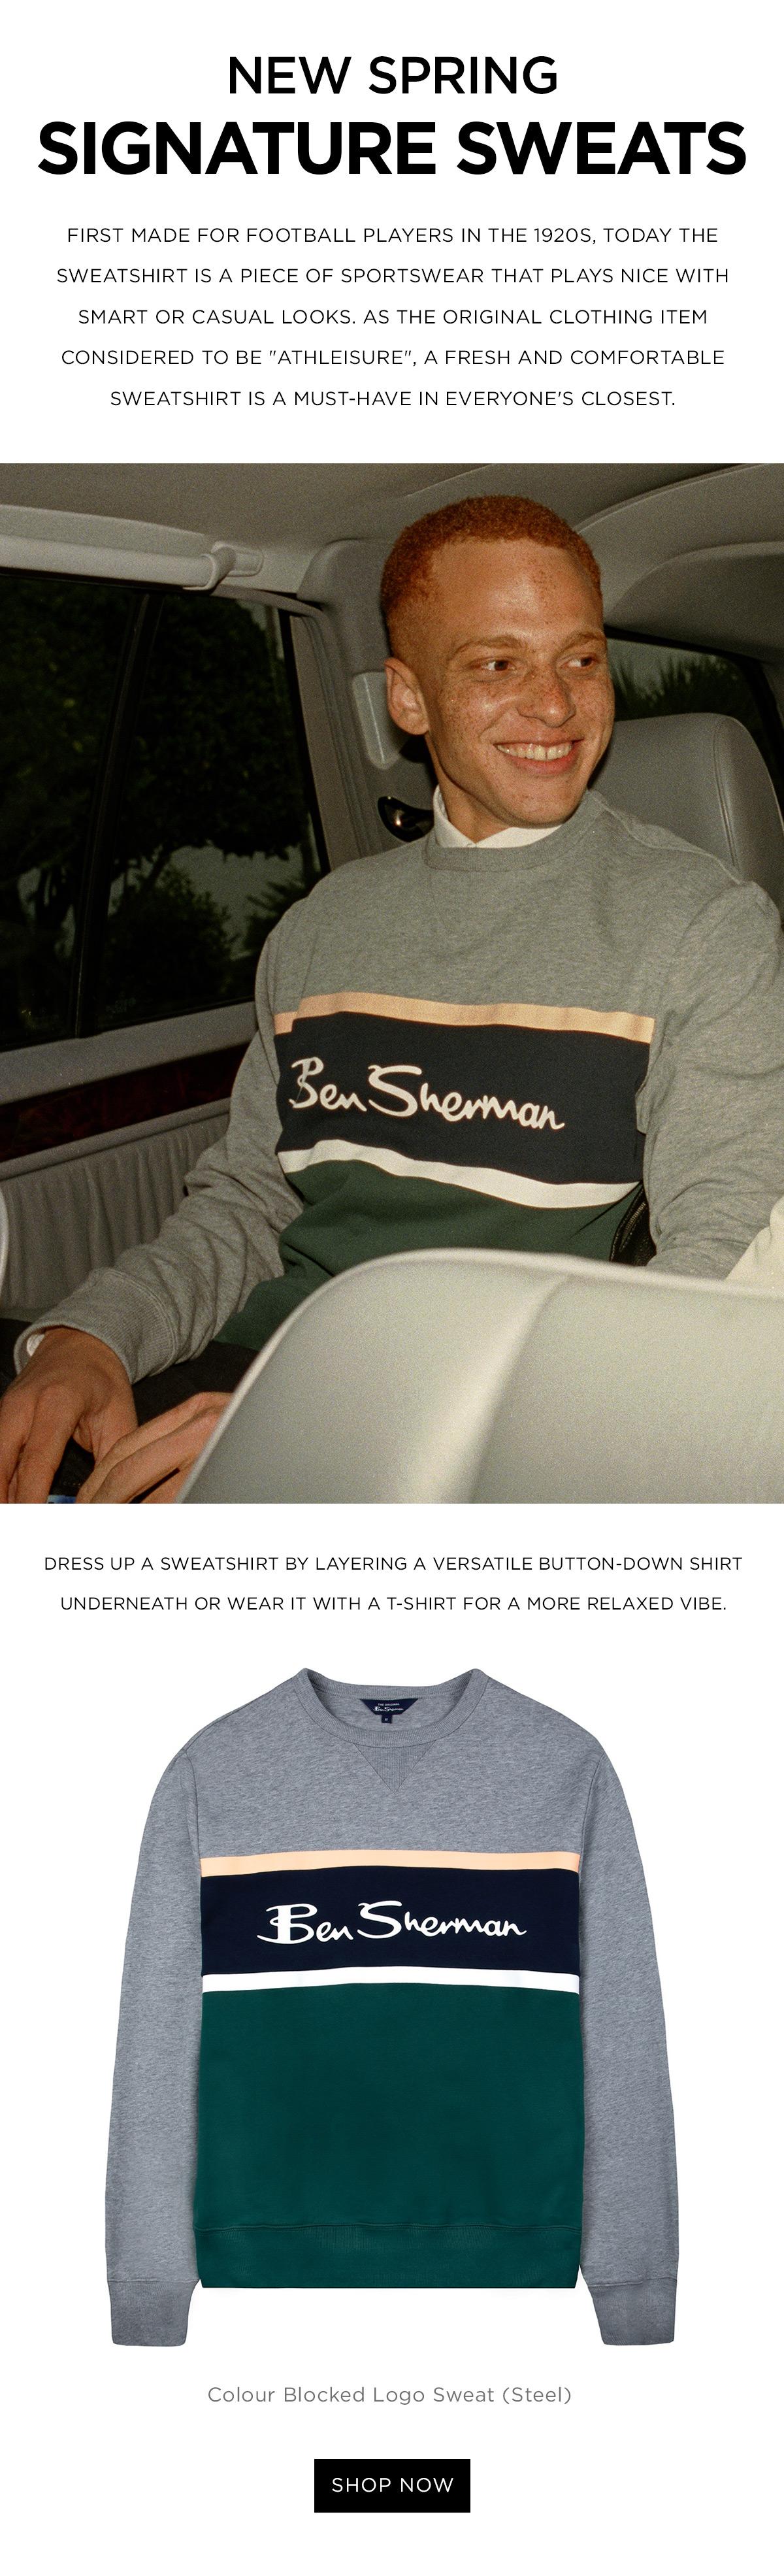 The sweatshirt - smart or casual looks